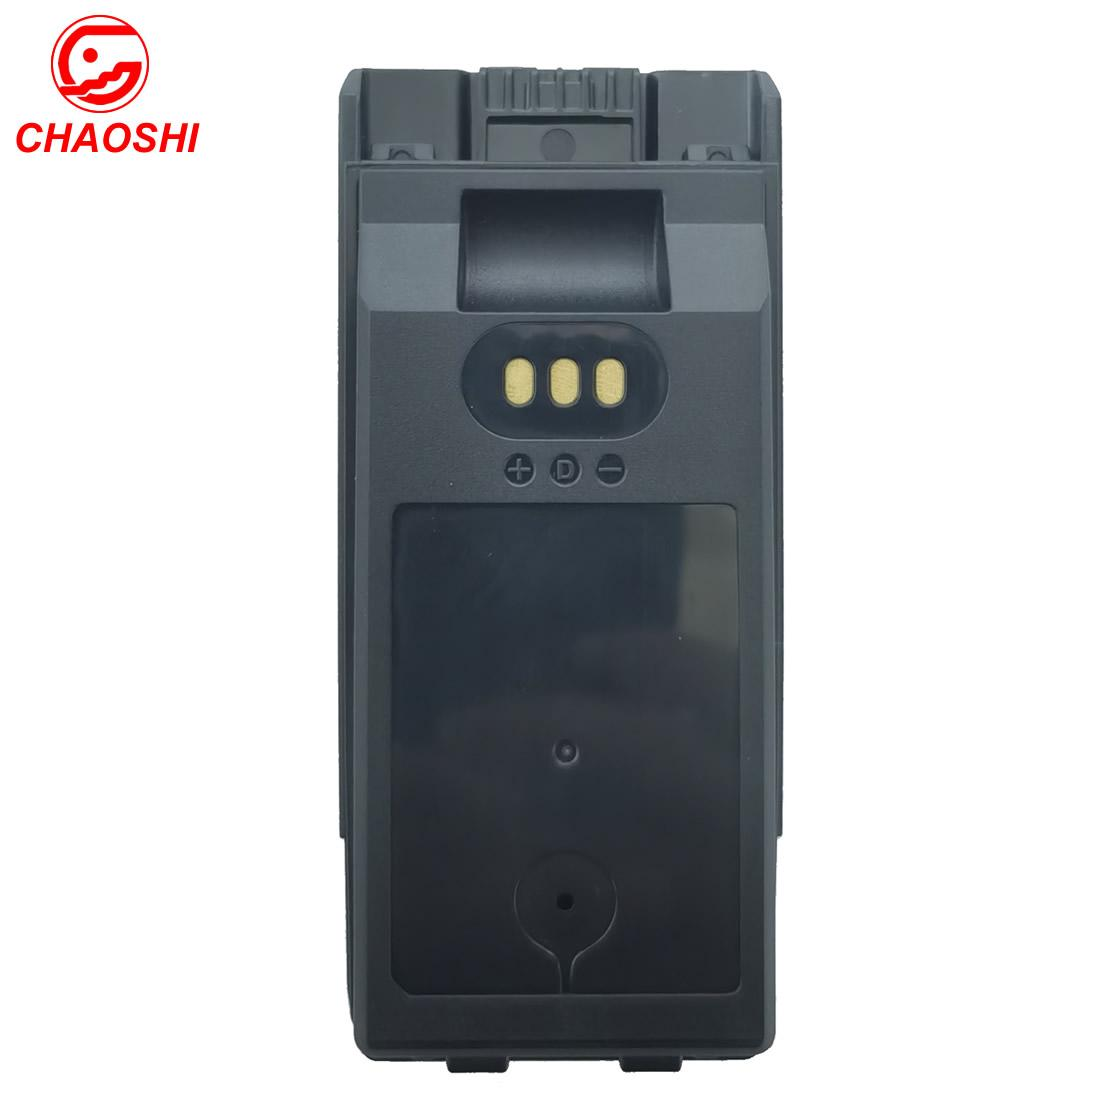 BP283對講機電池 IC-F3400D, IC-F4400D, IC-F70 1